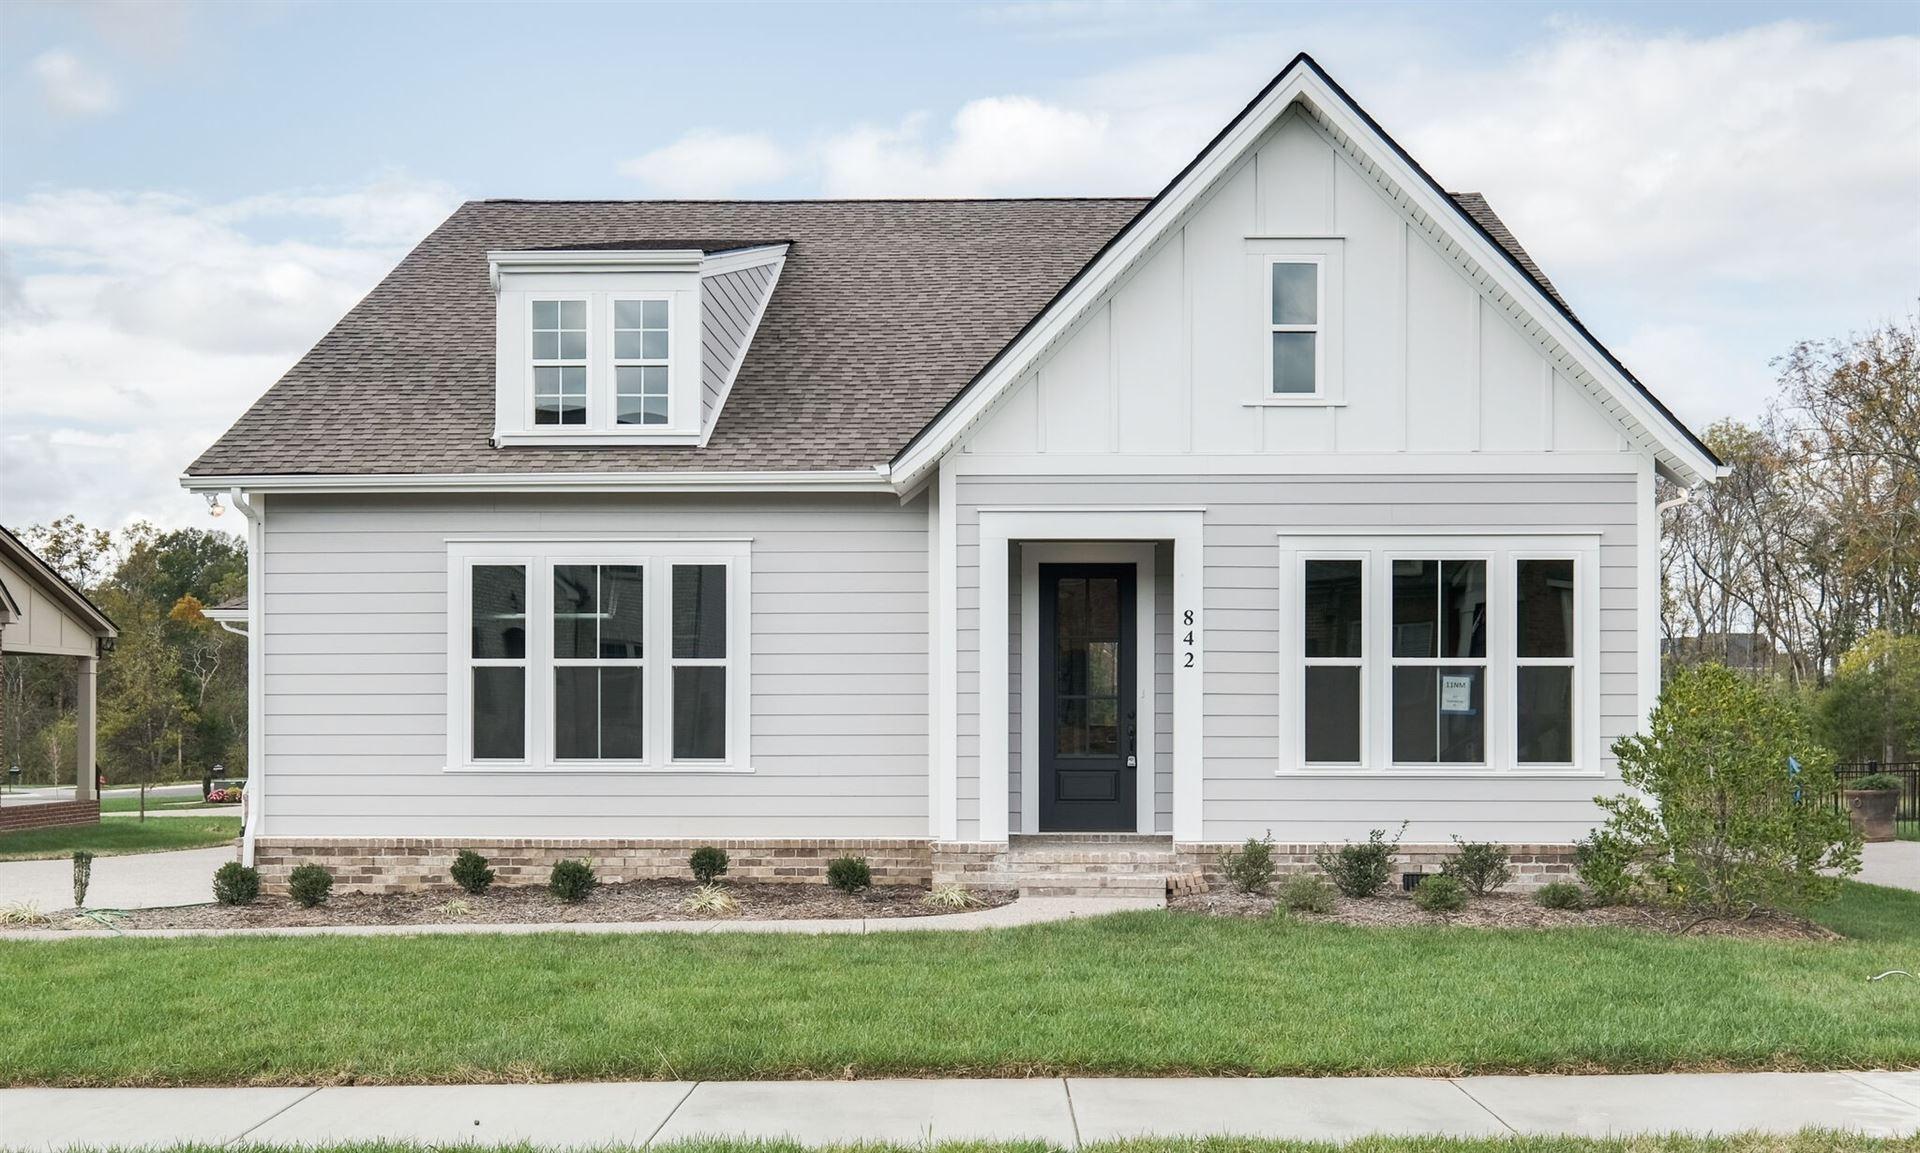 Photo of 842 Nolenmeade Place, Nolensville, TN 37135 (MLS # 2208109)